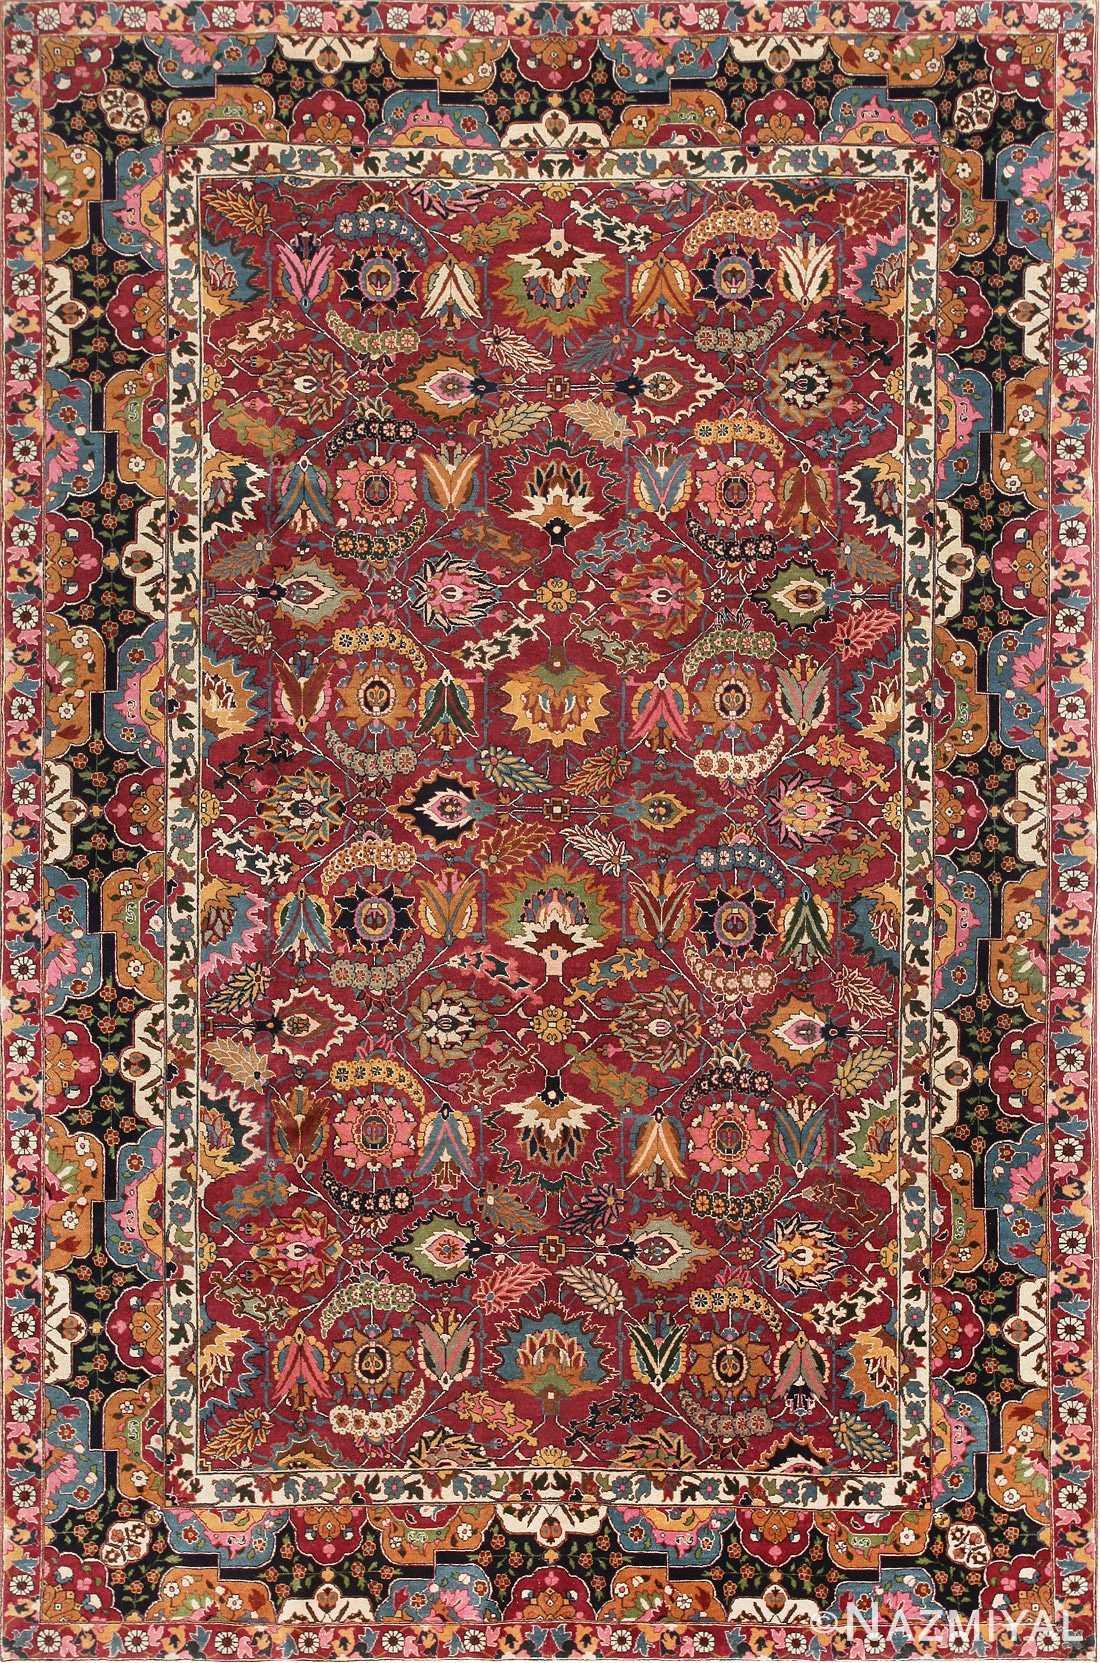 Antique Persian Tabriz Sickle Leaf Rug 47474 Detail/Large View